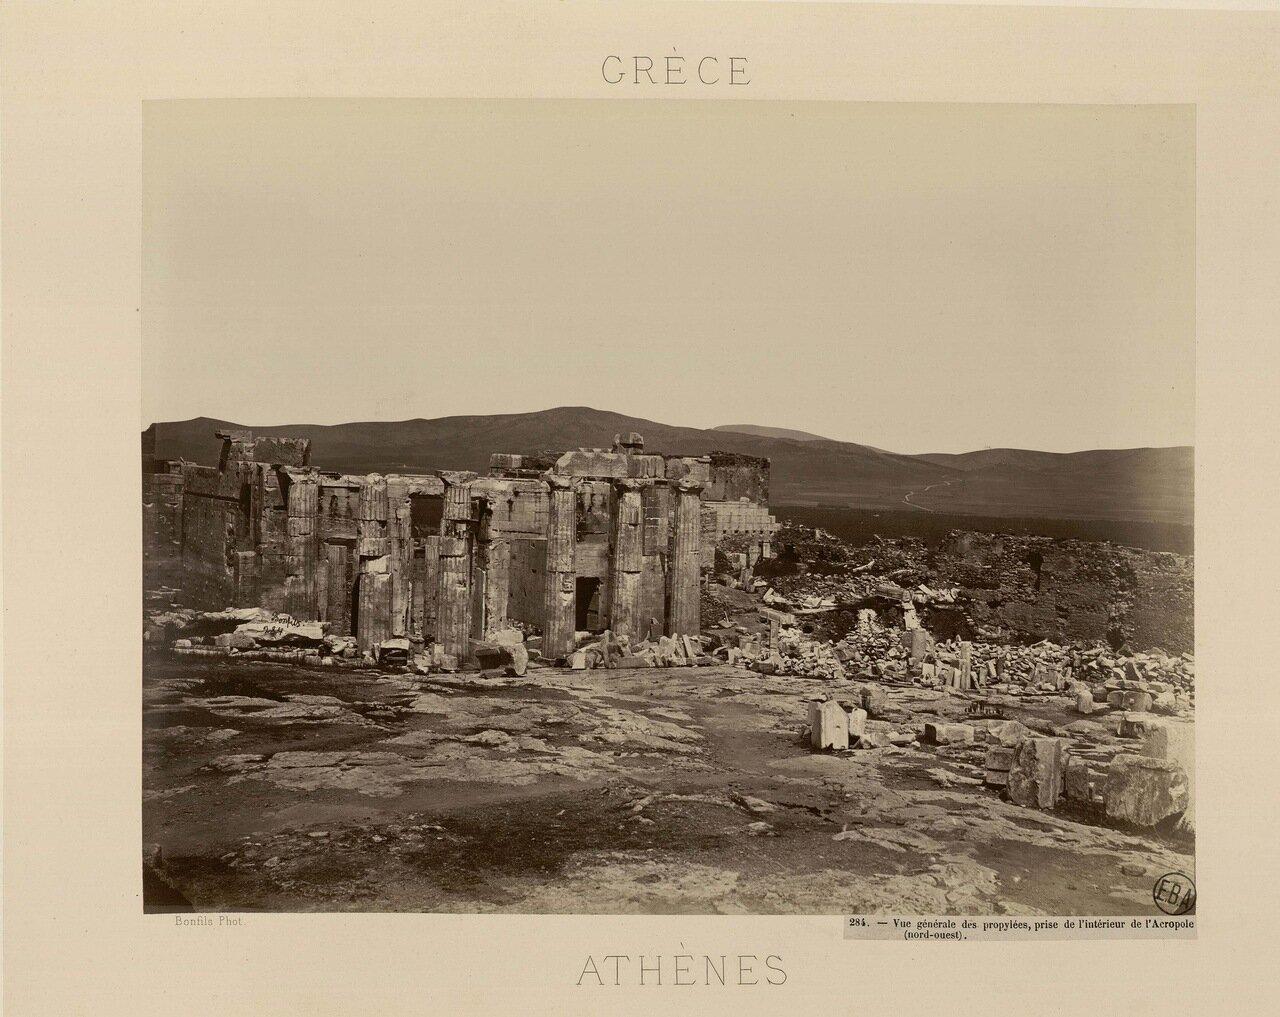 05. Панорама Пропилеев, снятая с Акрополя